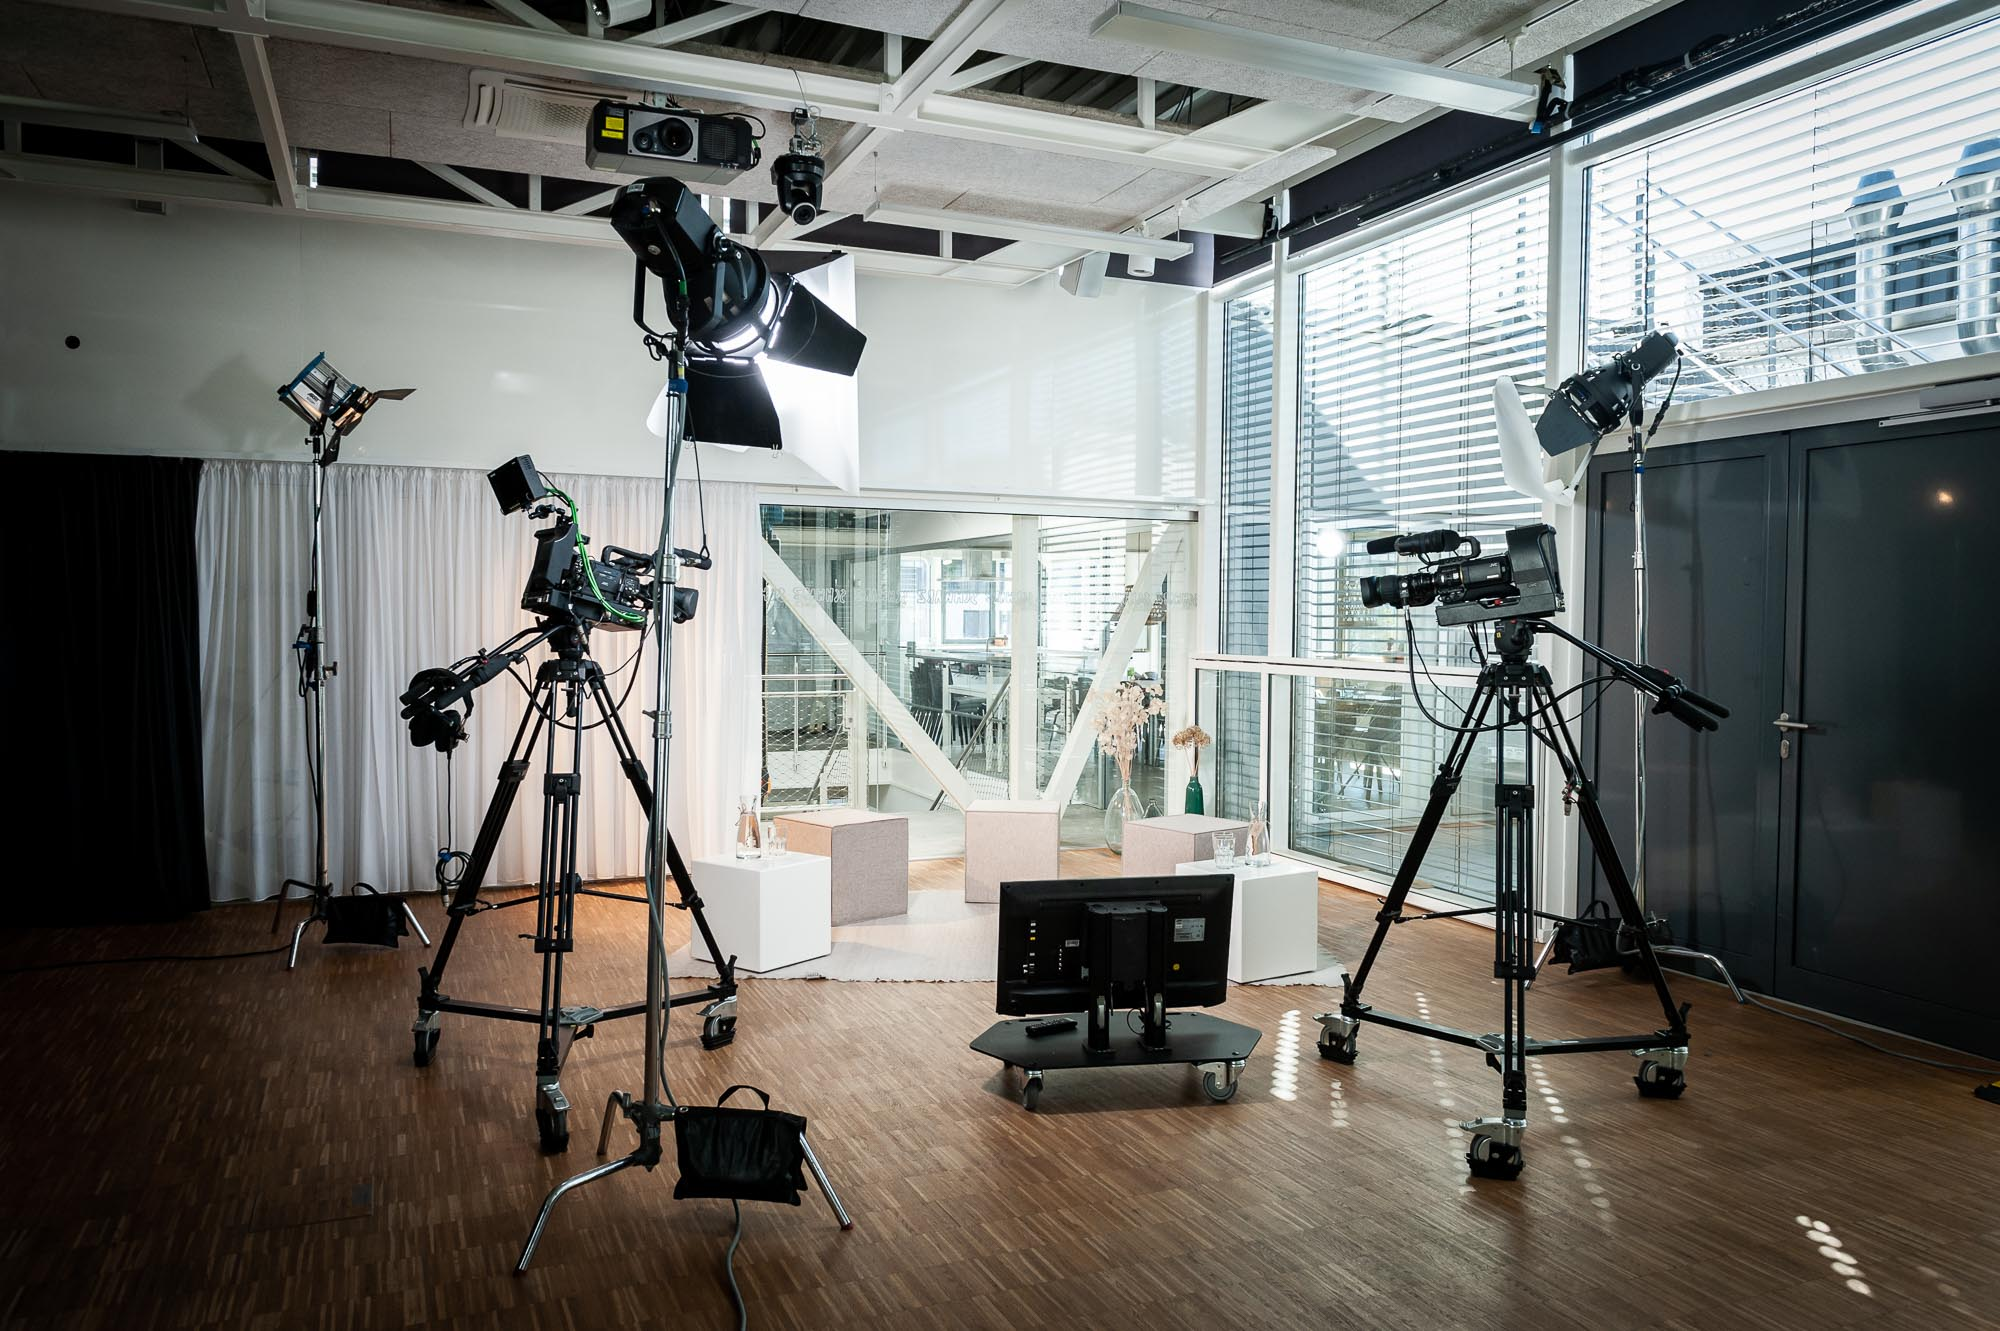 Limelight Veranstaltungstechnik live streaming studio Corvatsch